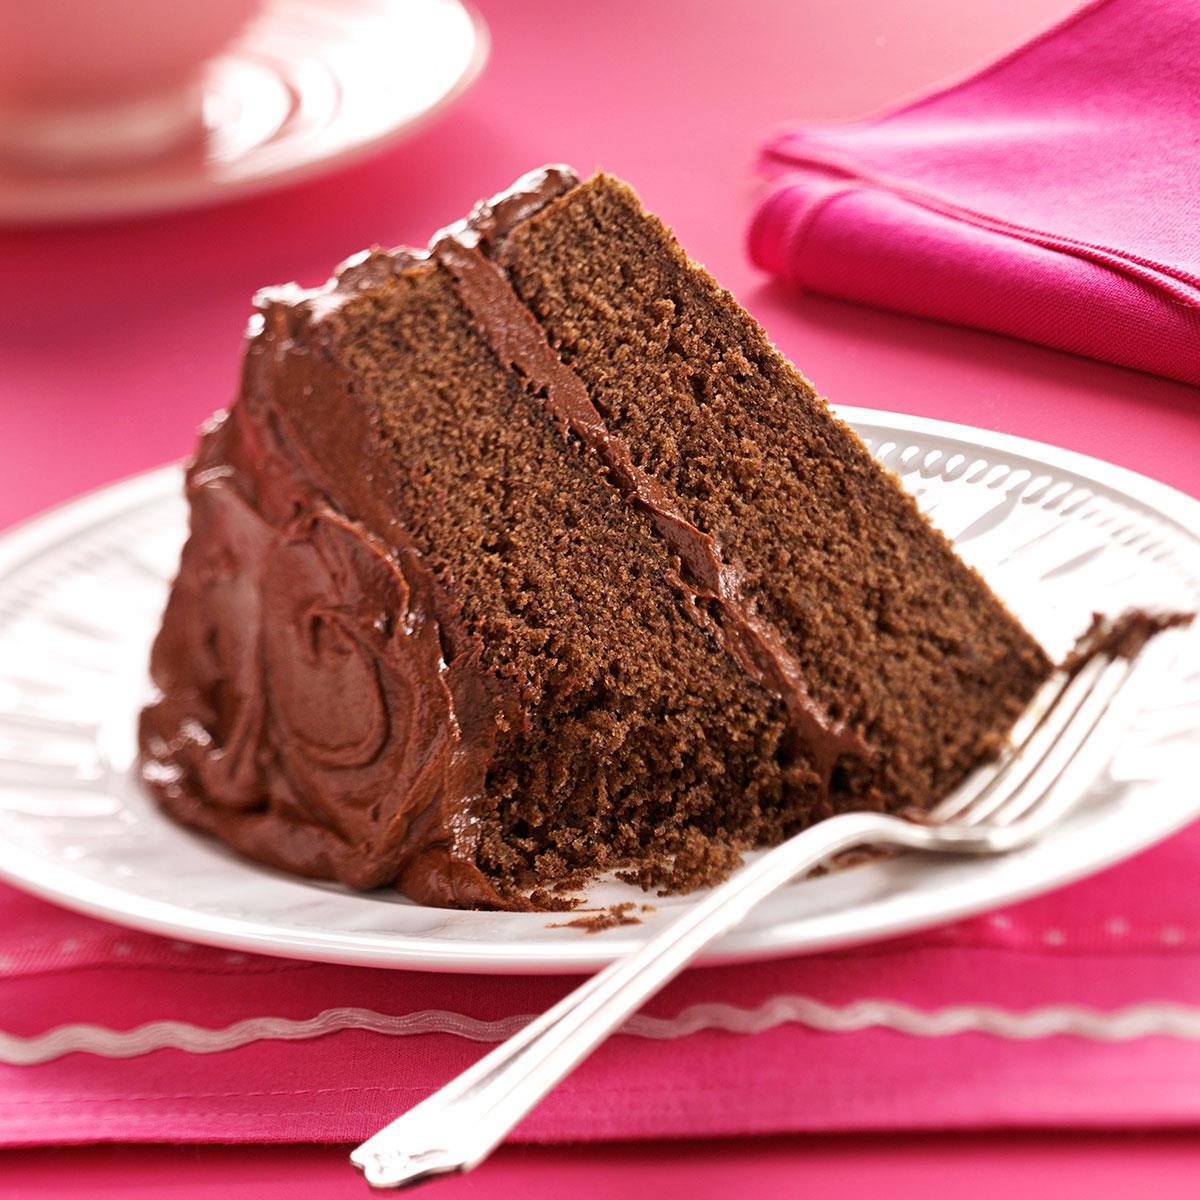 Devil 39 s food cake with chocolate fudge frosting recipe taste of home - Herve cuisine cake chocolat ...